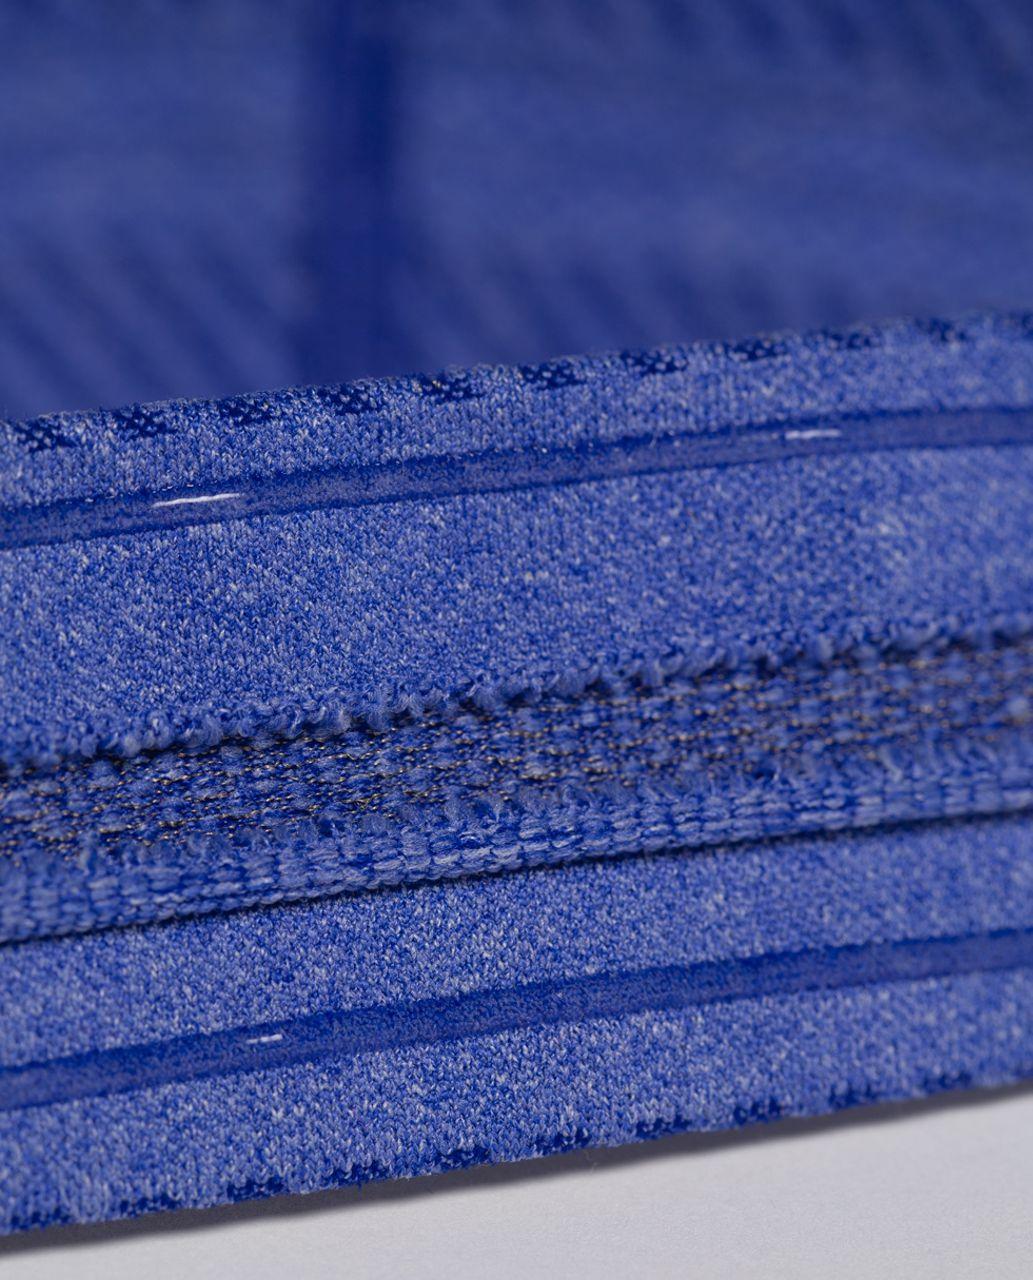 Lululemon Swiftly Headband - Heathered Pigment Blue